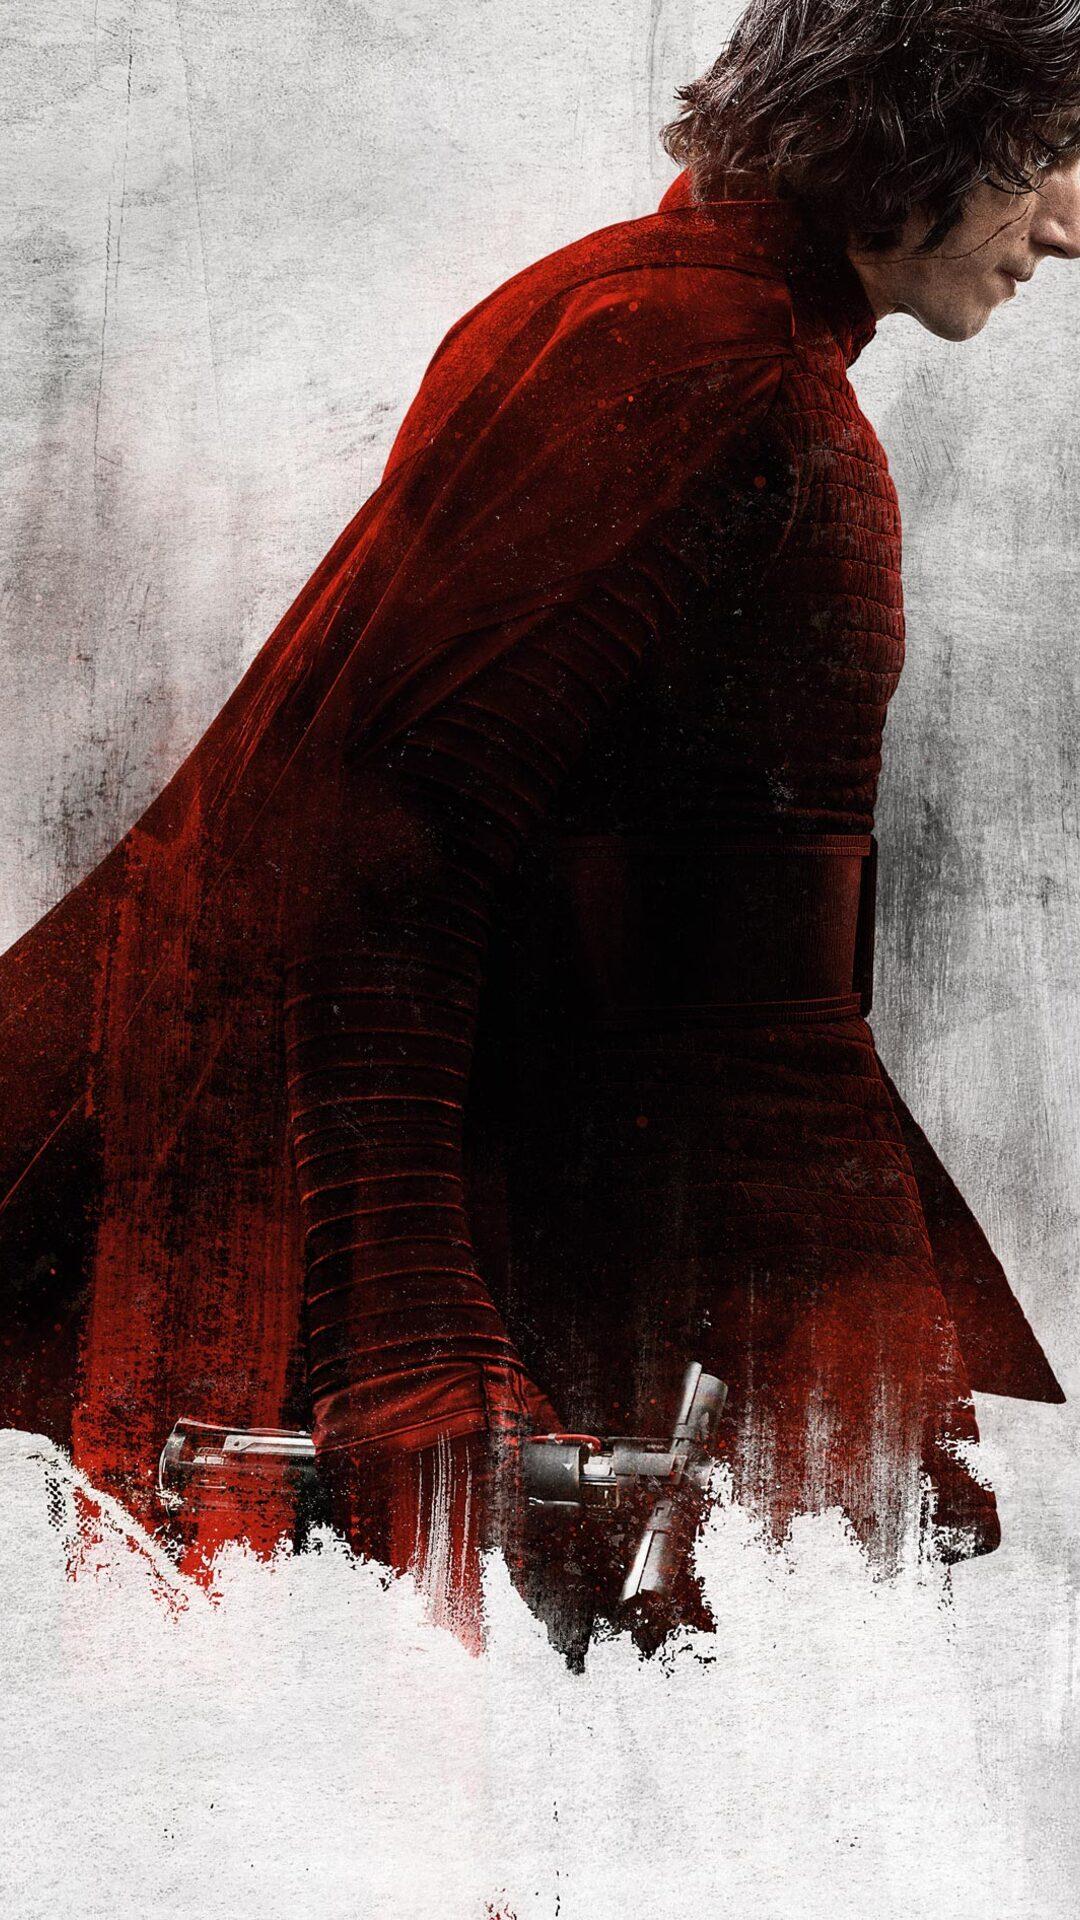 1080x1920 Kylo Ren Star Wars The Last Jedi Iphone 7,6s,6 ...